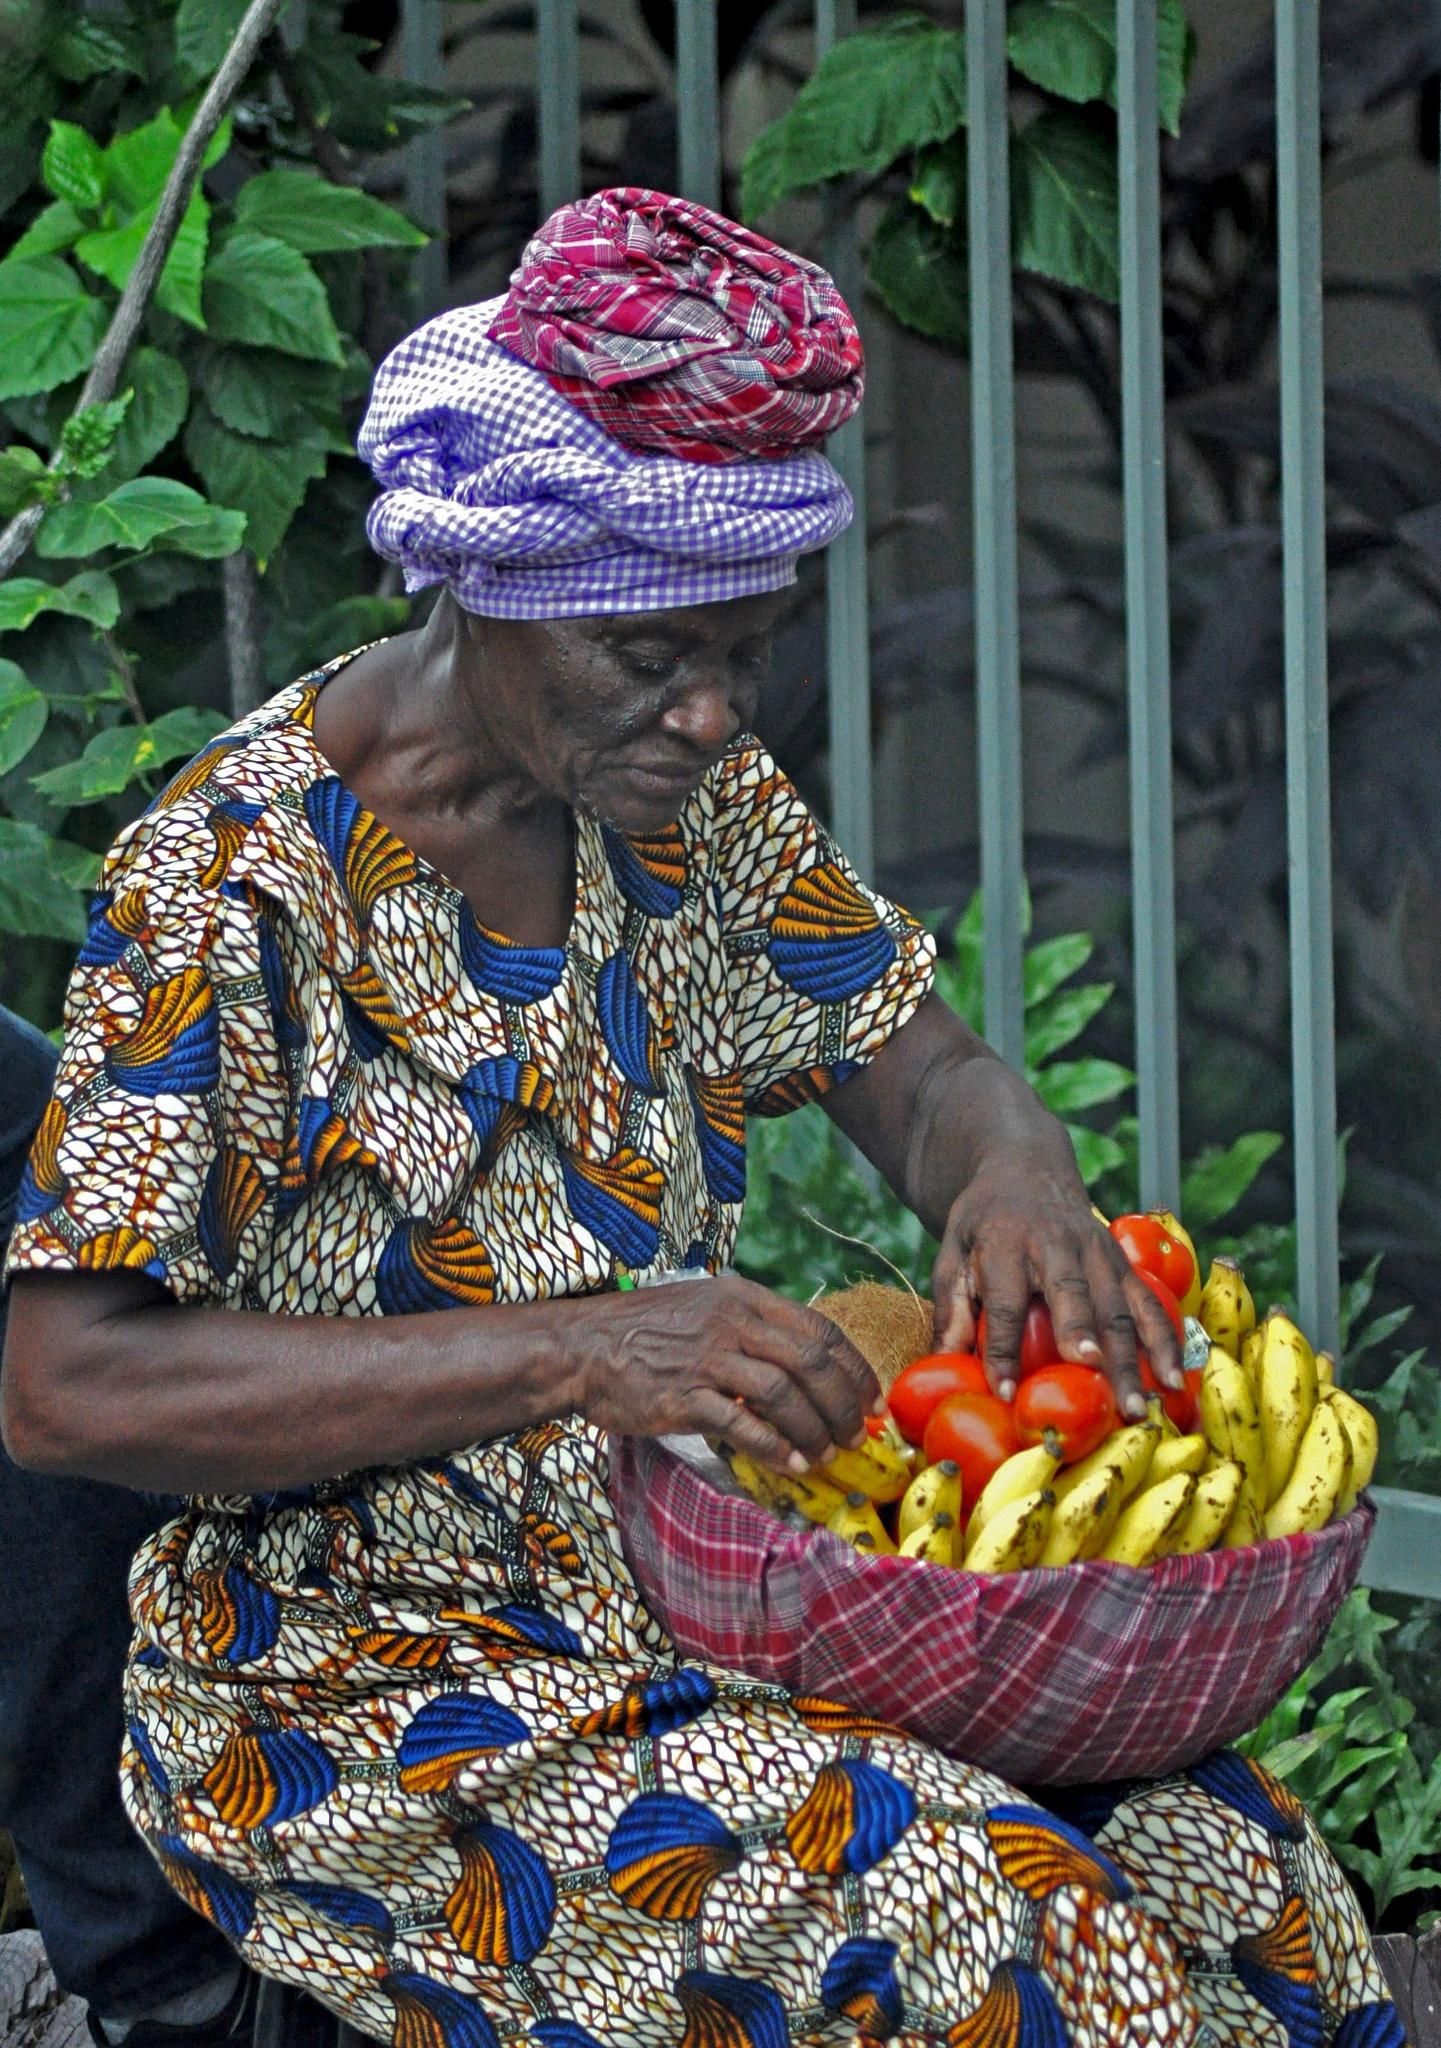 Old Jamaican lady by Francine Verronneau